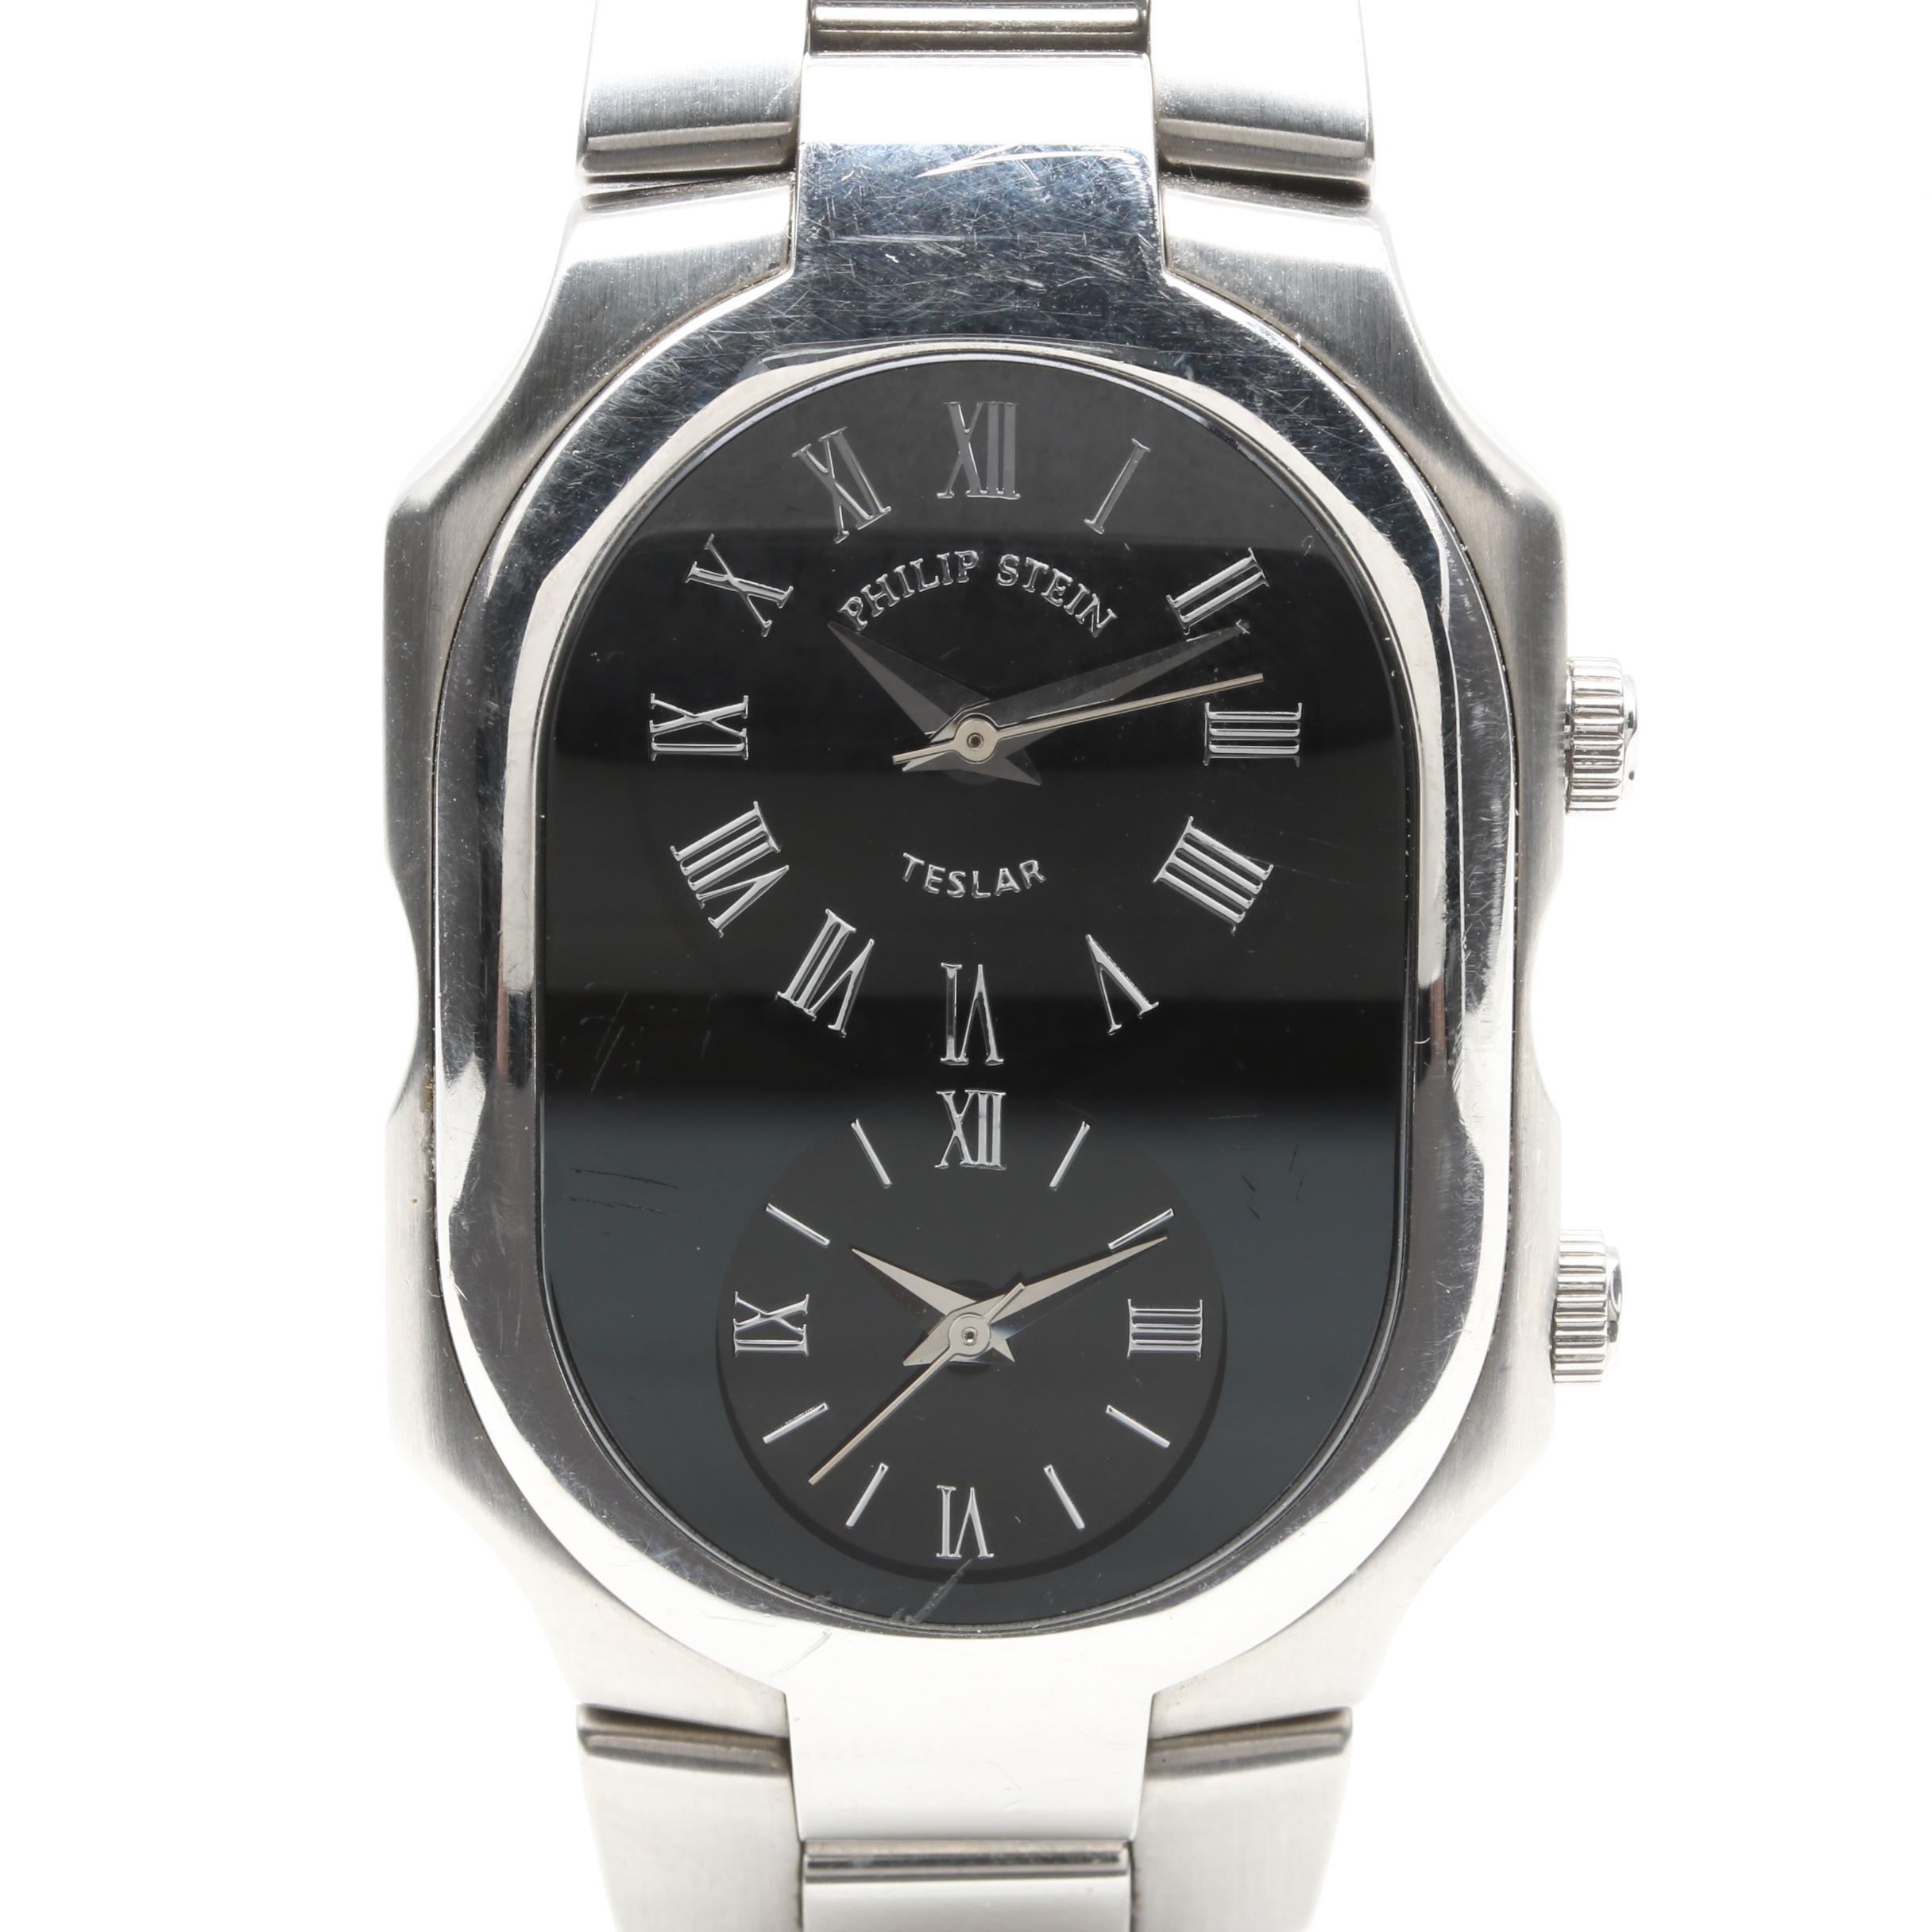 "Philip Stein ""Teslar"" Dual Dial Wristwatch"